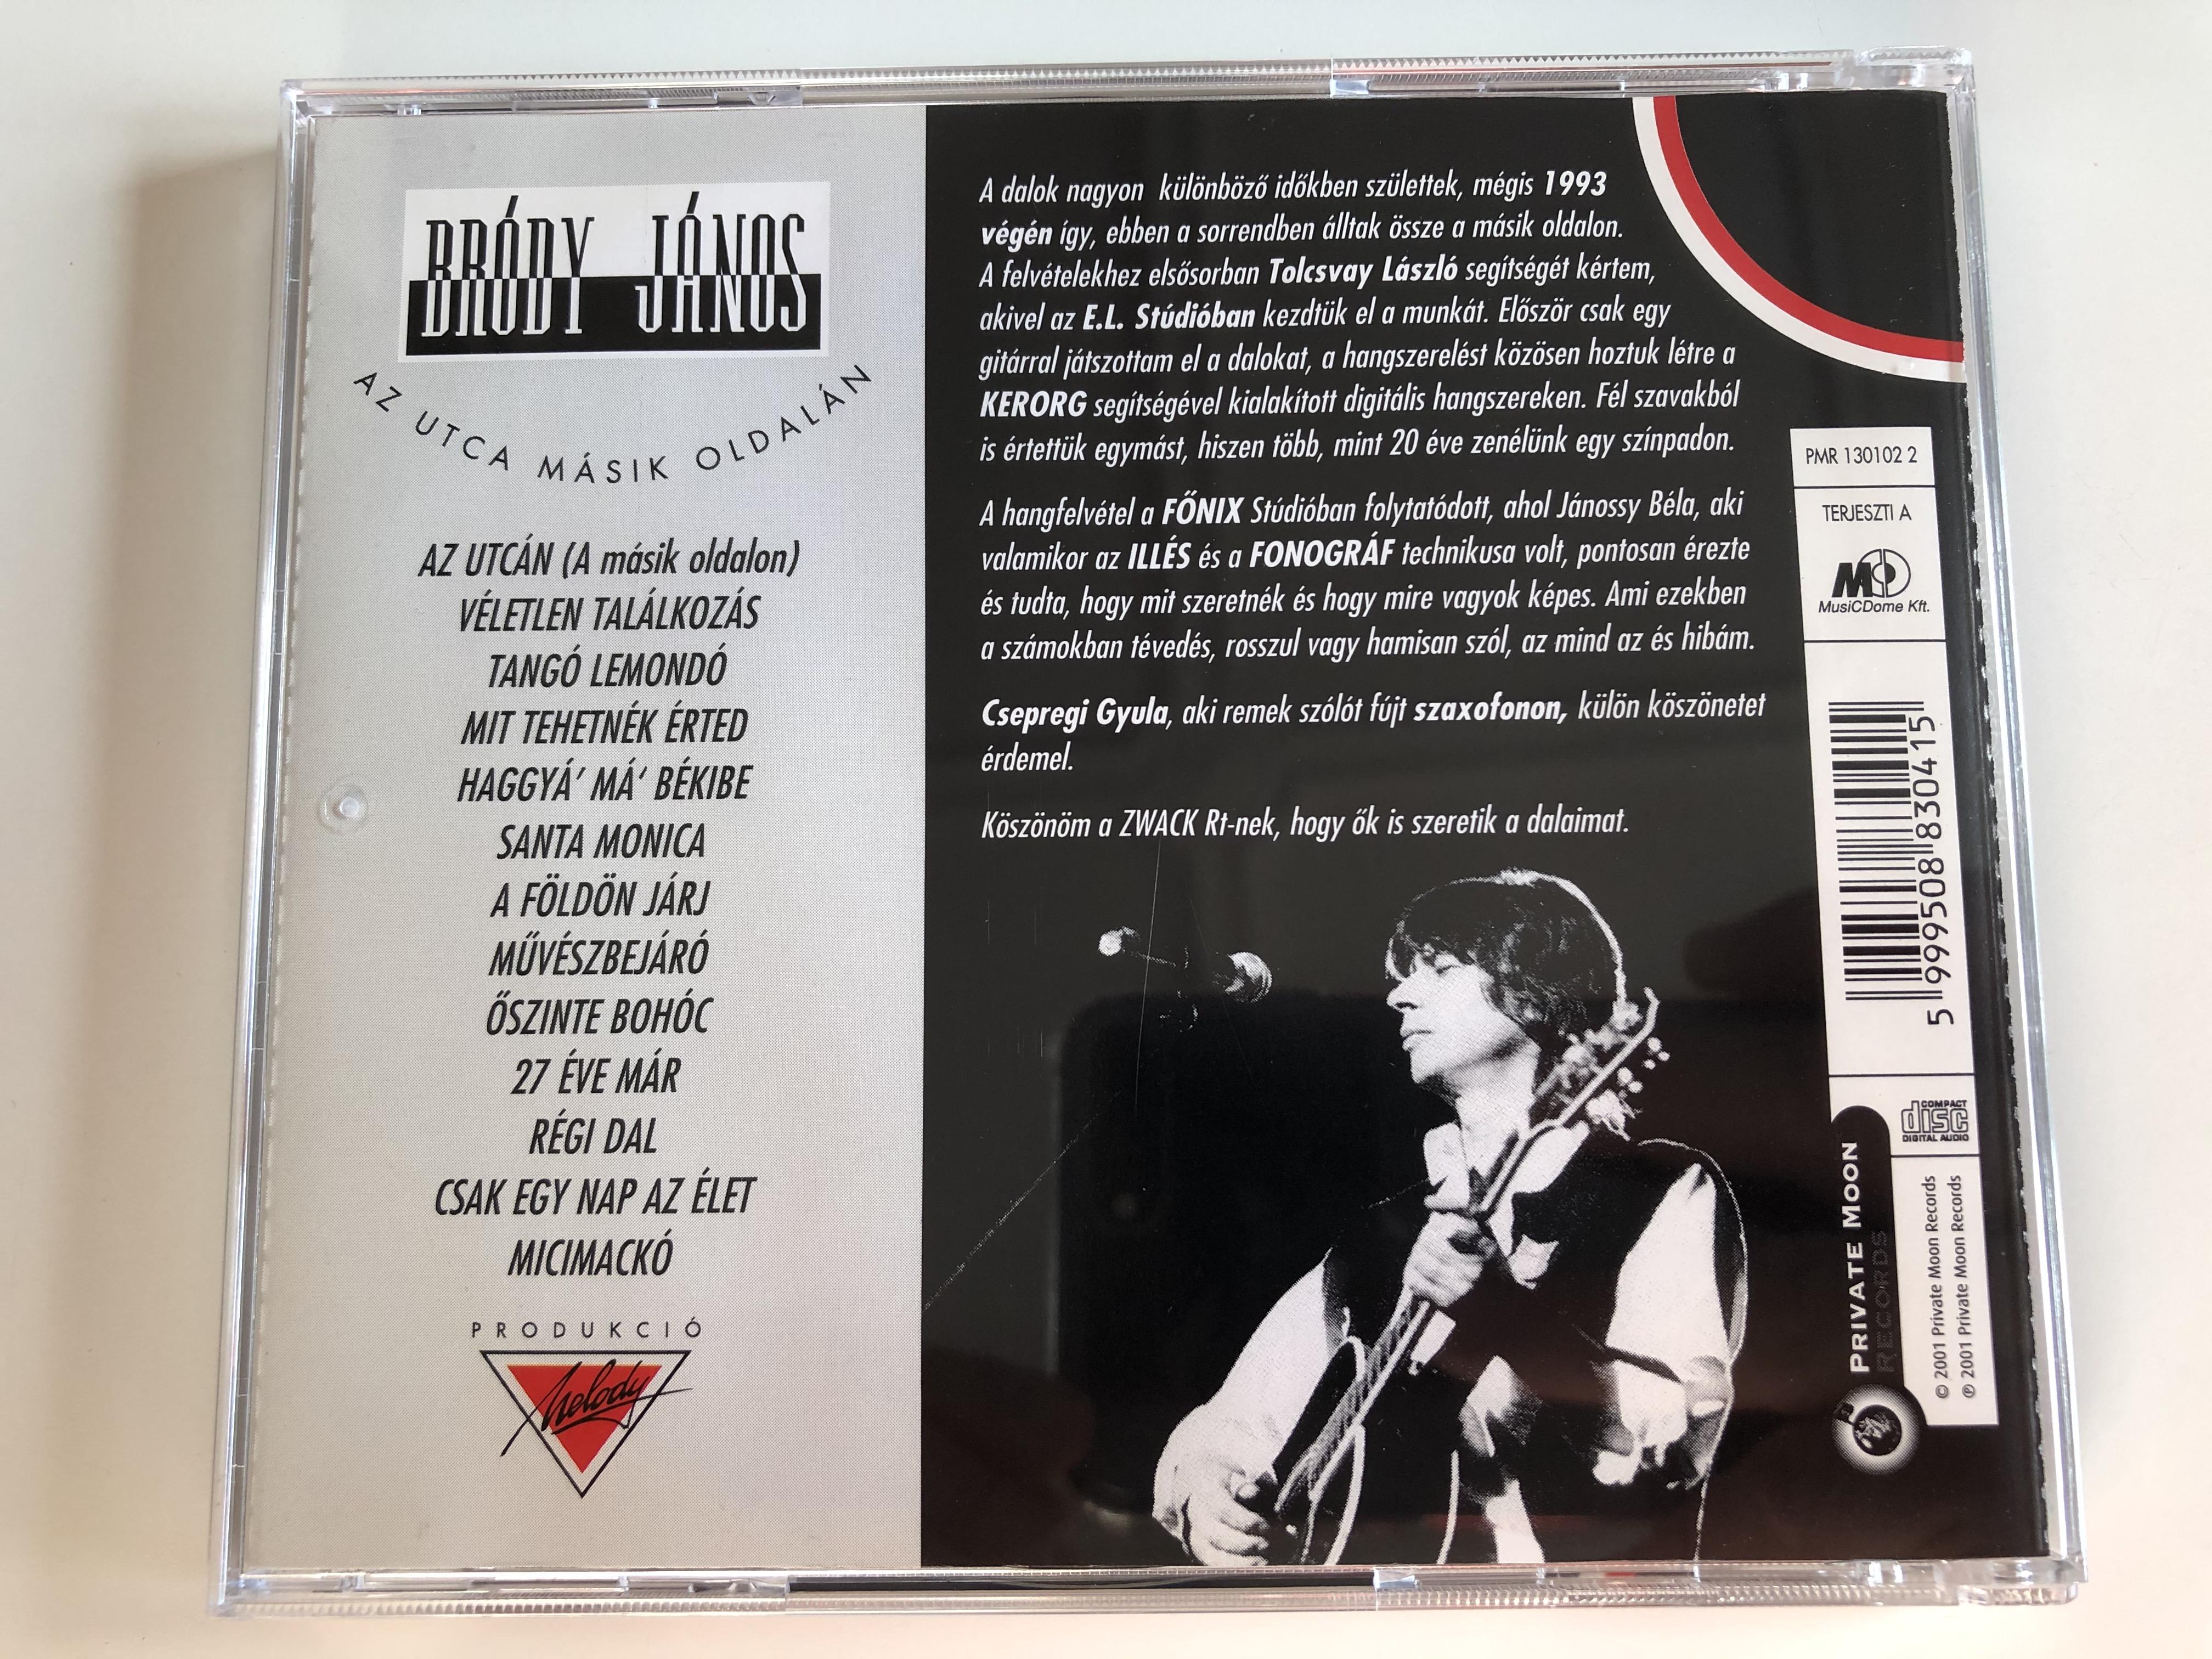 br-dy-j-nos-az-utca-m-sik-oldal-n-private-moon-records-audio-cd-2001-pmr-130102-2-5-.jpg